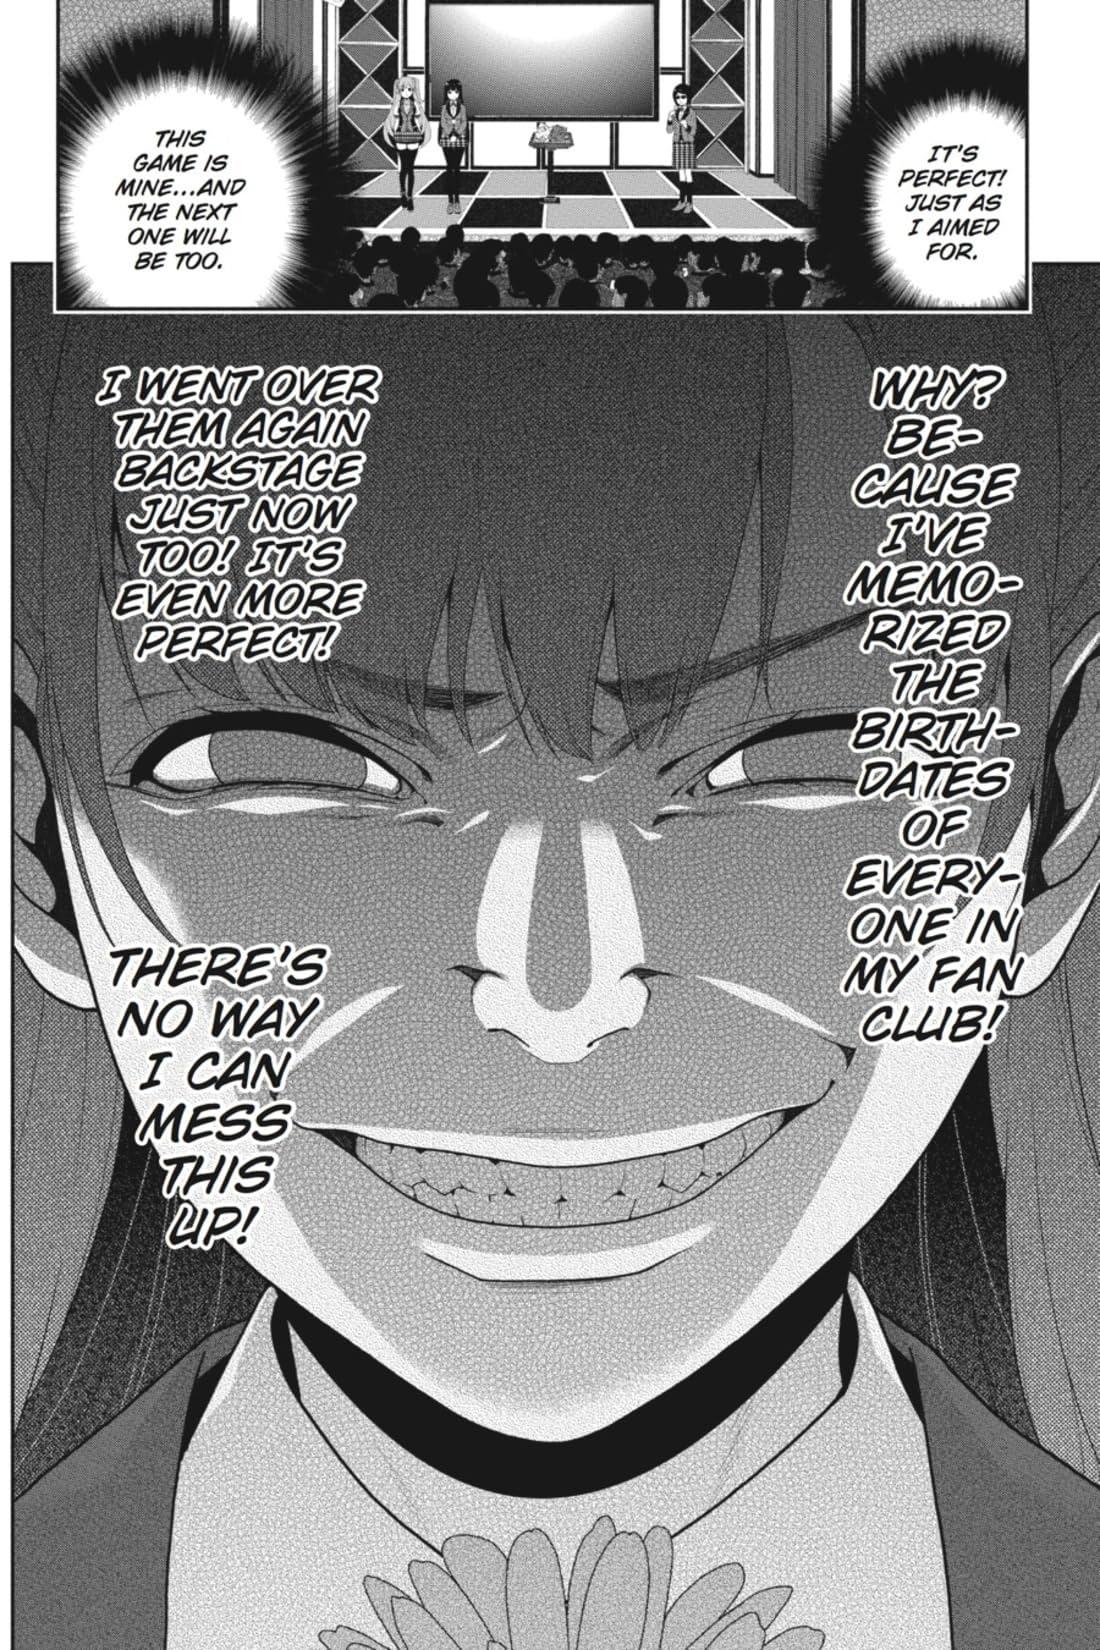 Kakegurui - Compulsive Gambler #21